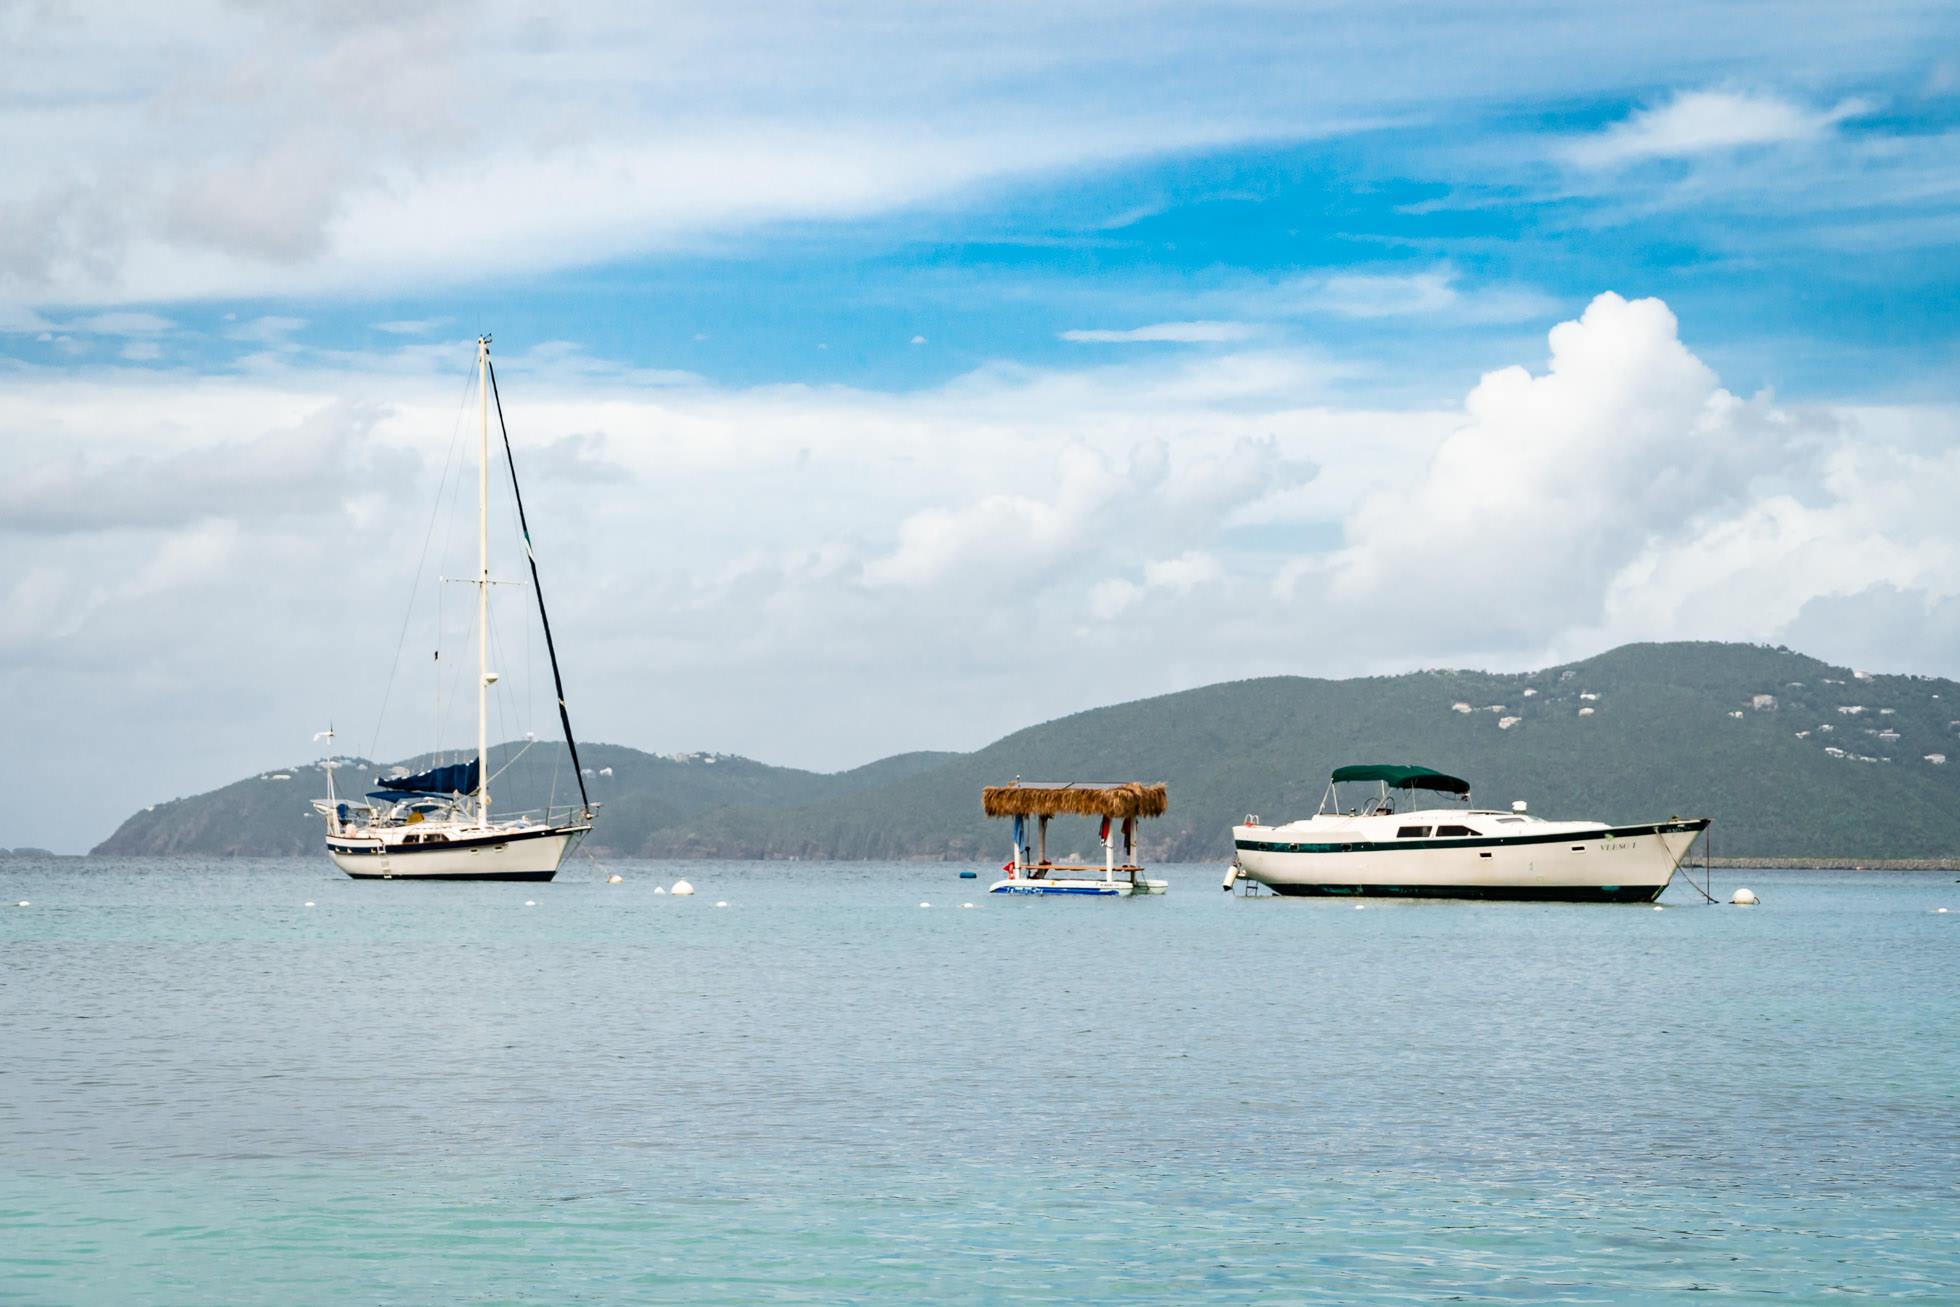 water island, united states virgin islands, honeymoon beach, snorkeling